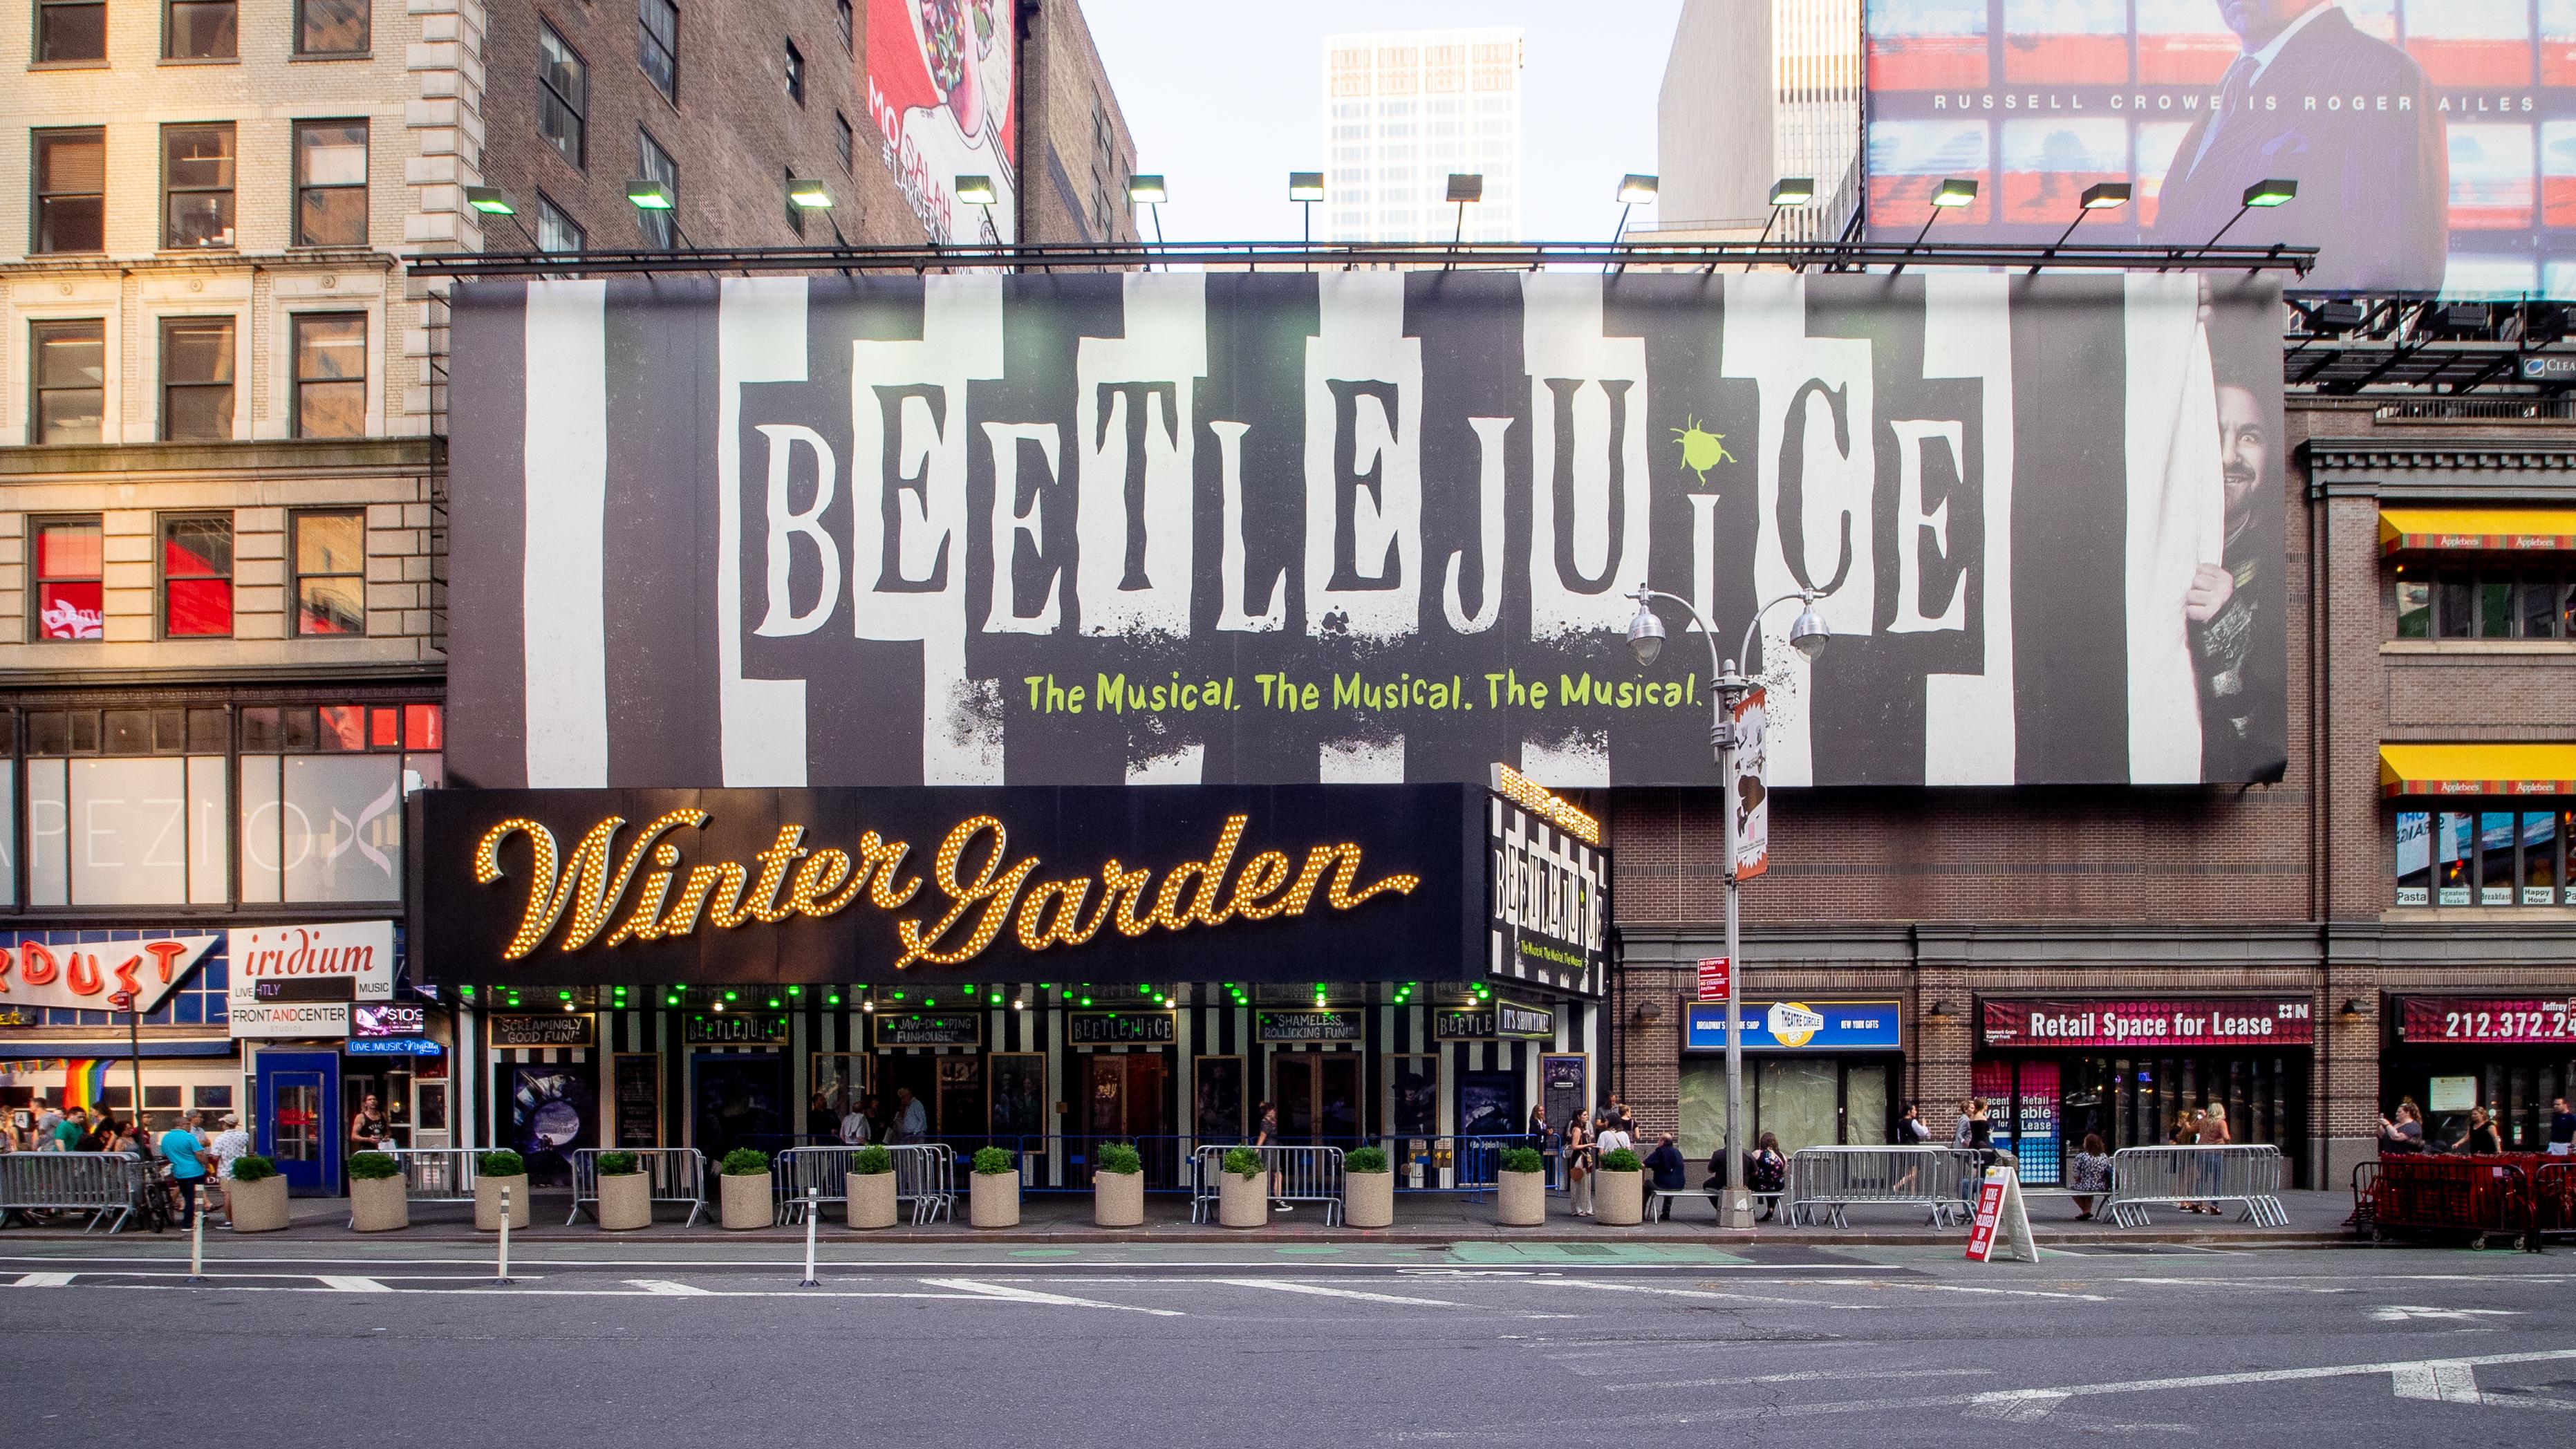 Winter Garden Theatre Gpedia Your Encyclopedia